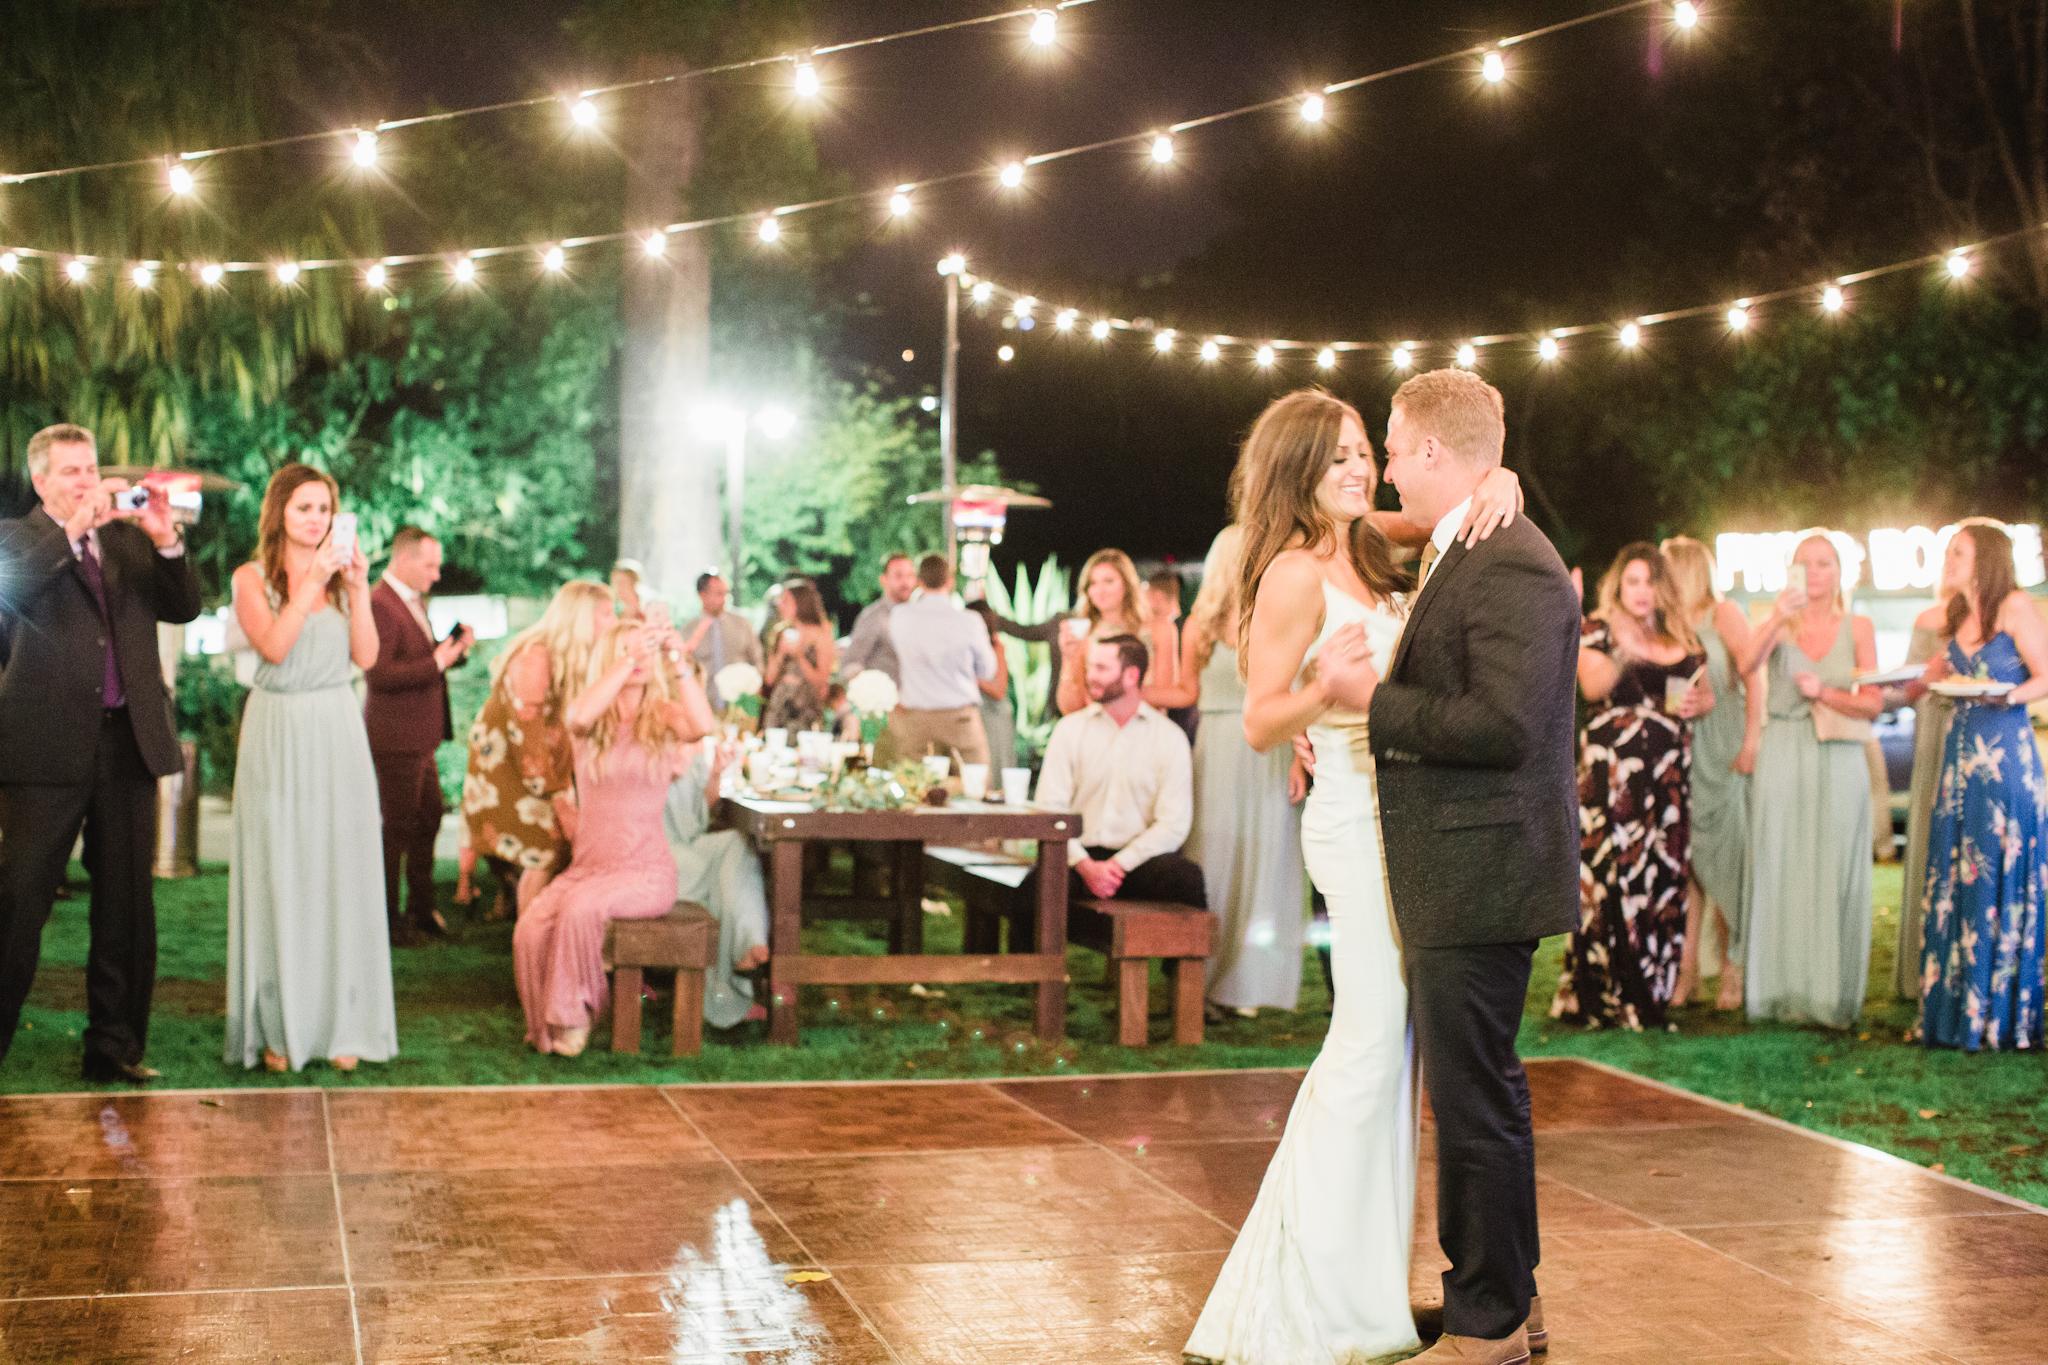 First dance as husband + wife <3